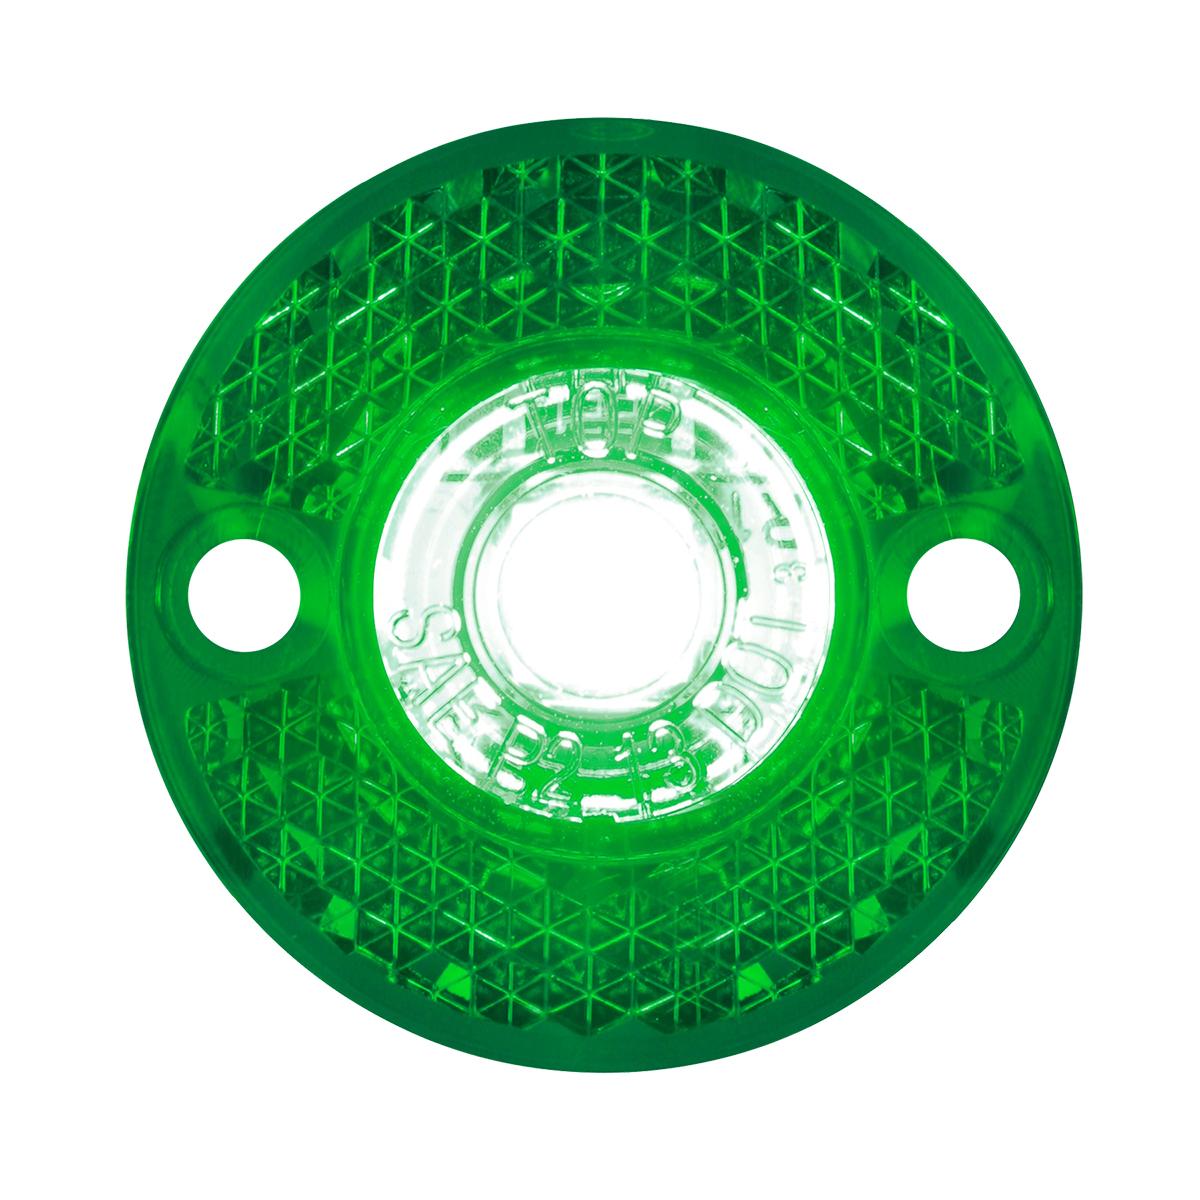 81786 Mini Surface Mount LED Light in Green/Green